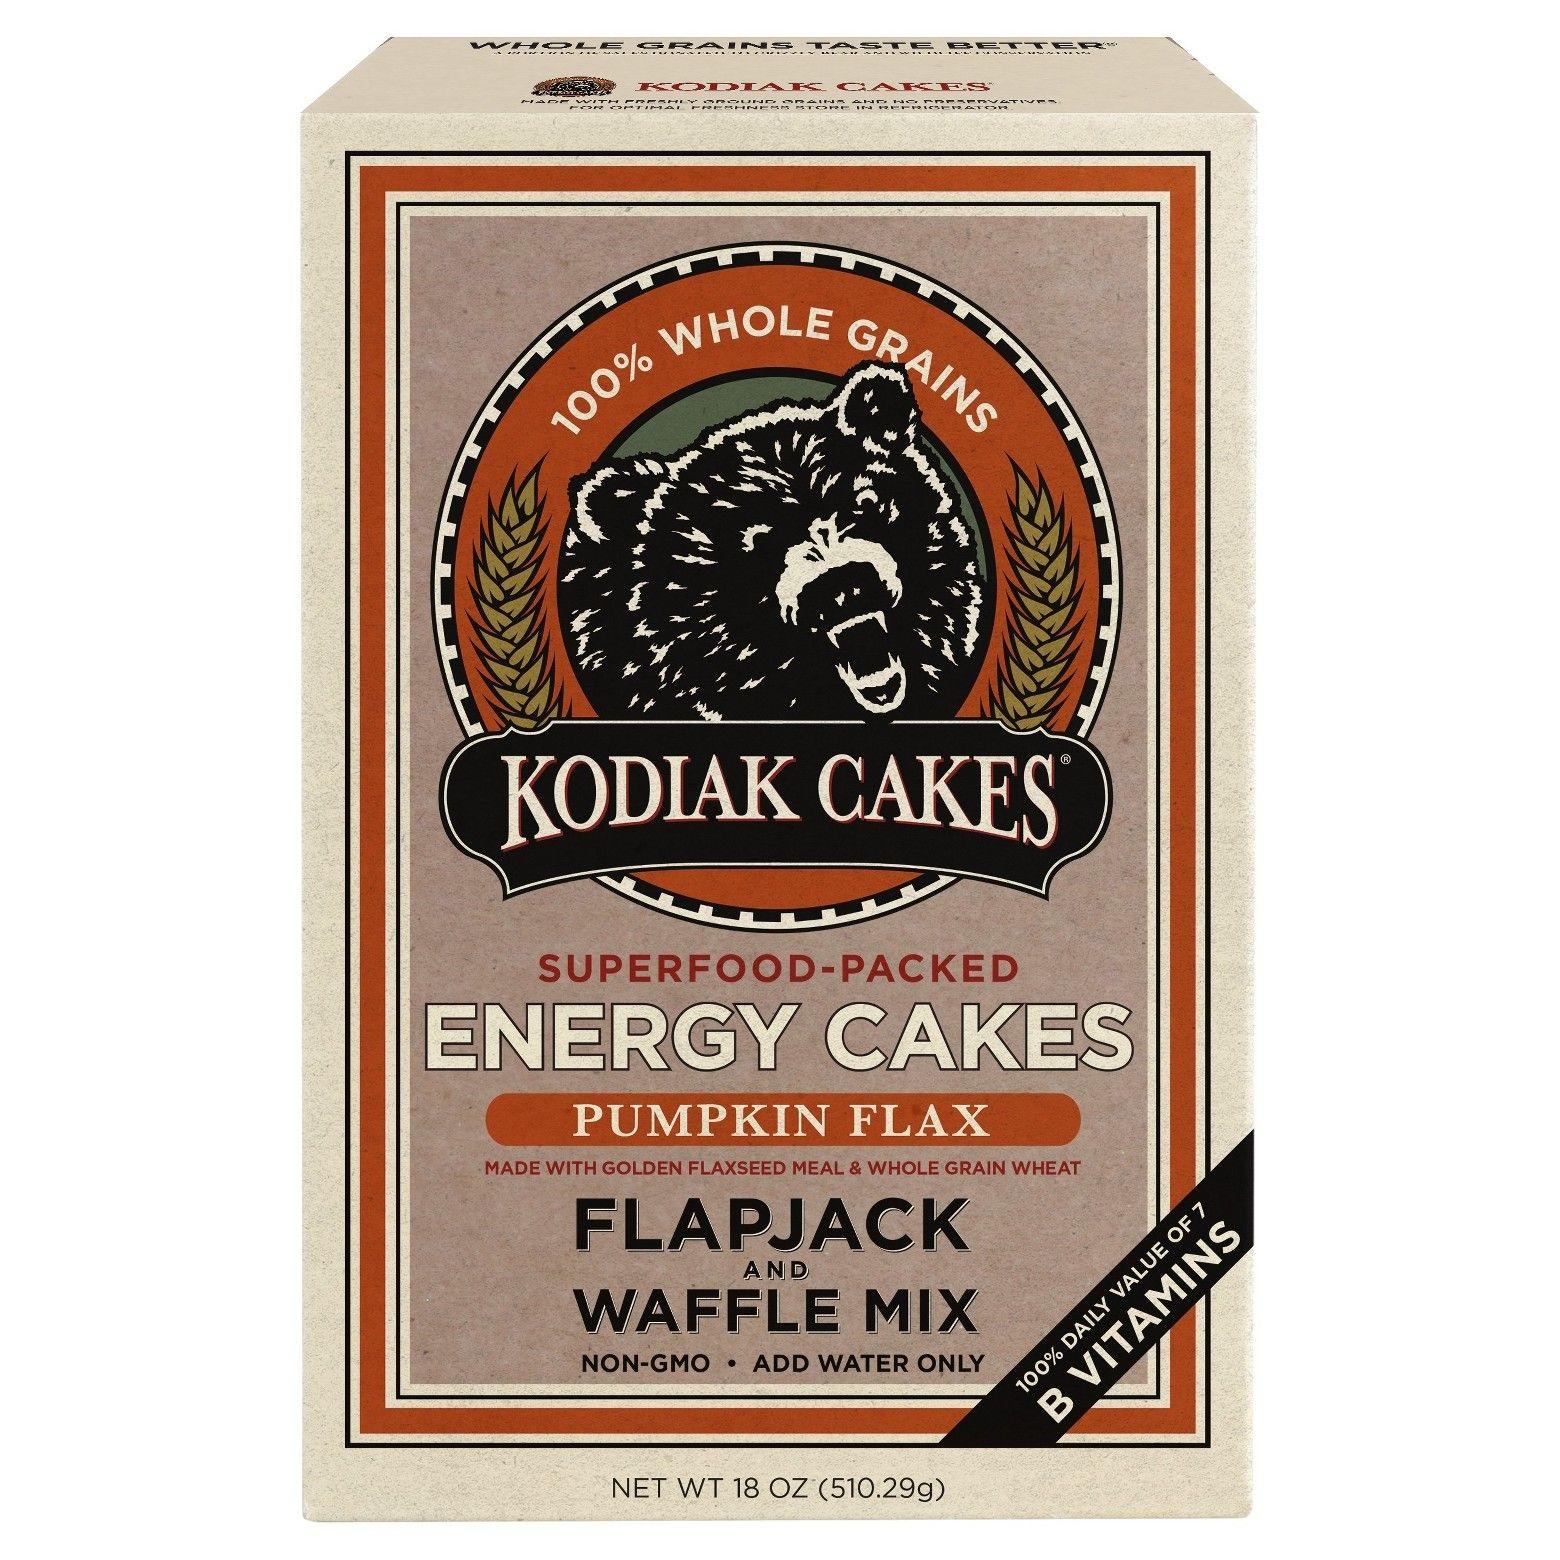 Kodiak cakes almond poppyseed flapjack waffle mix 18oz